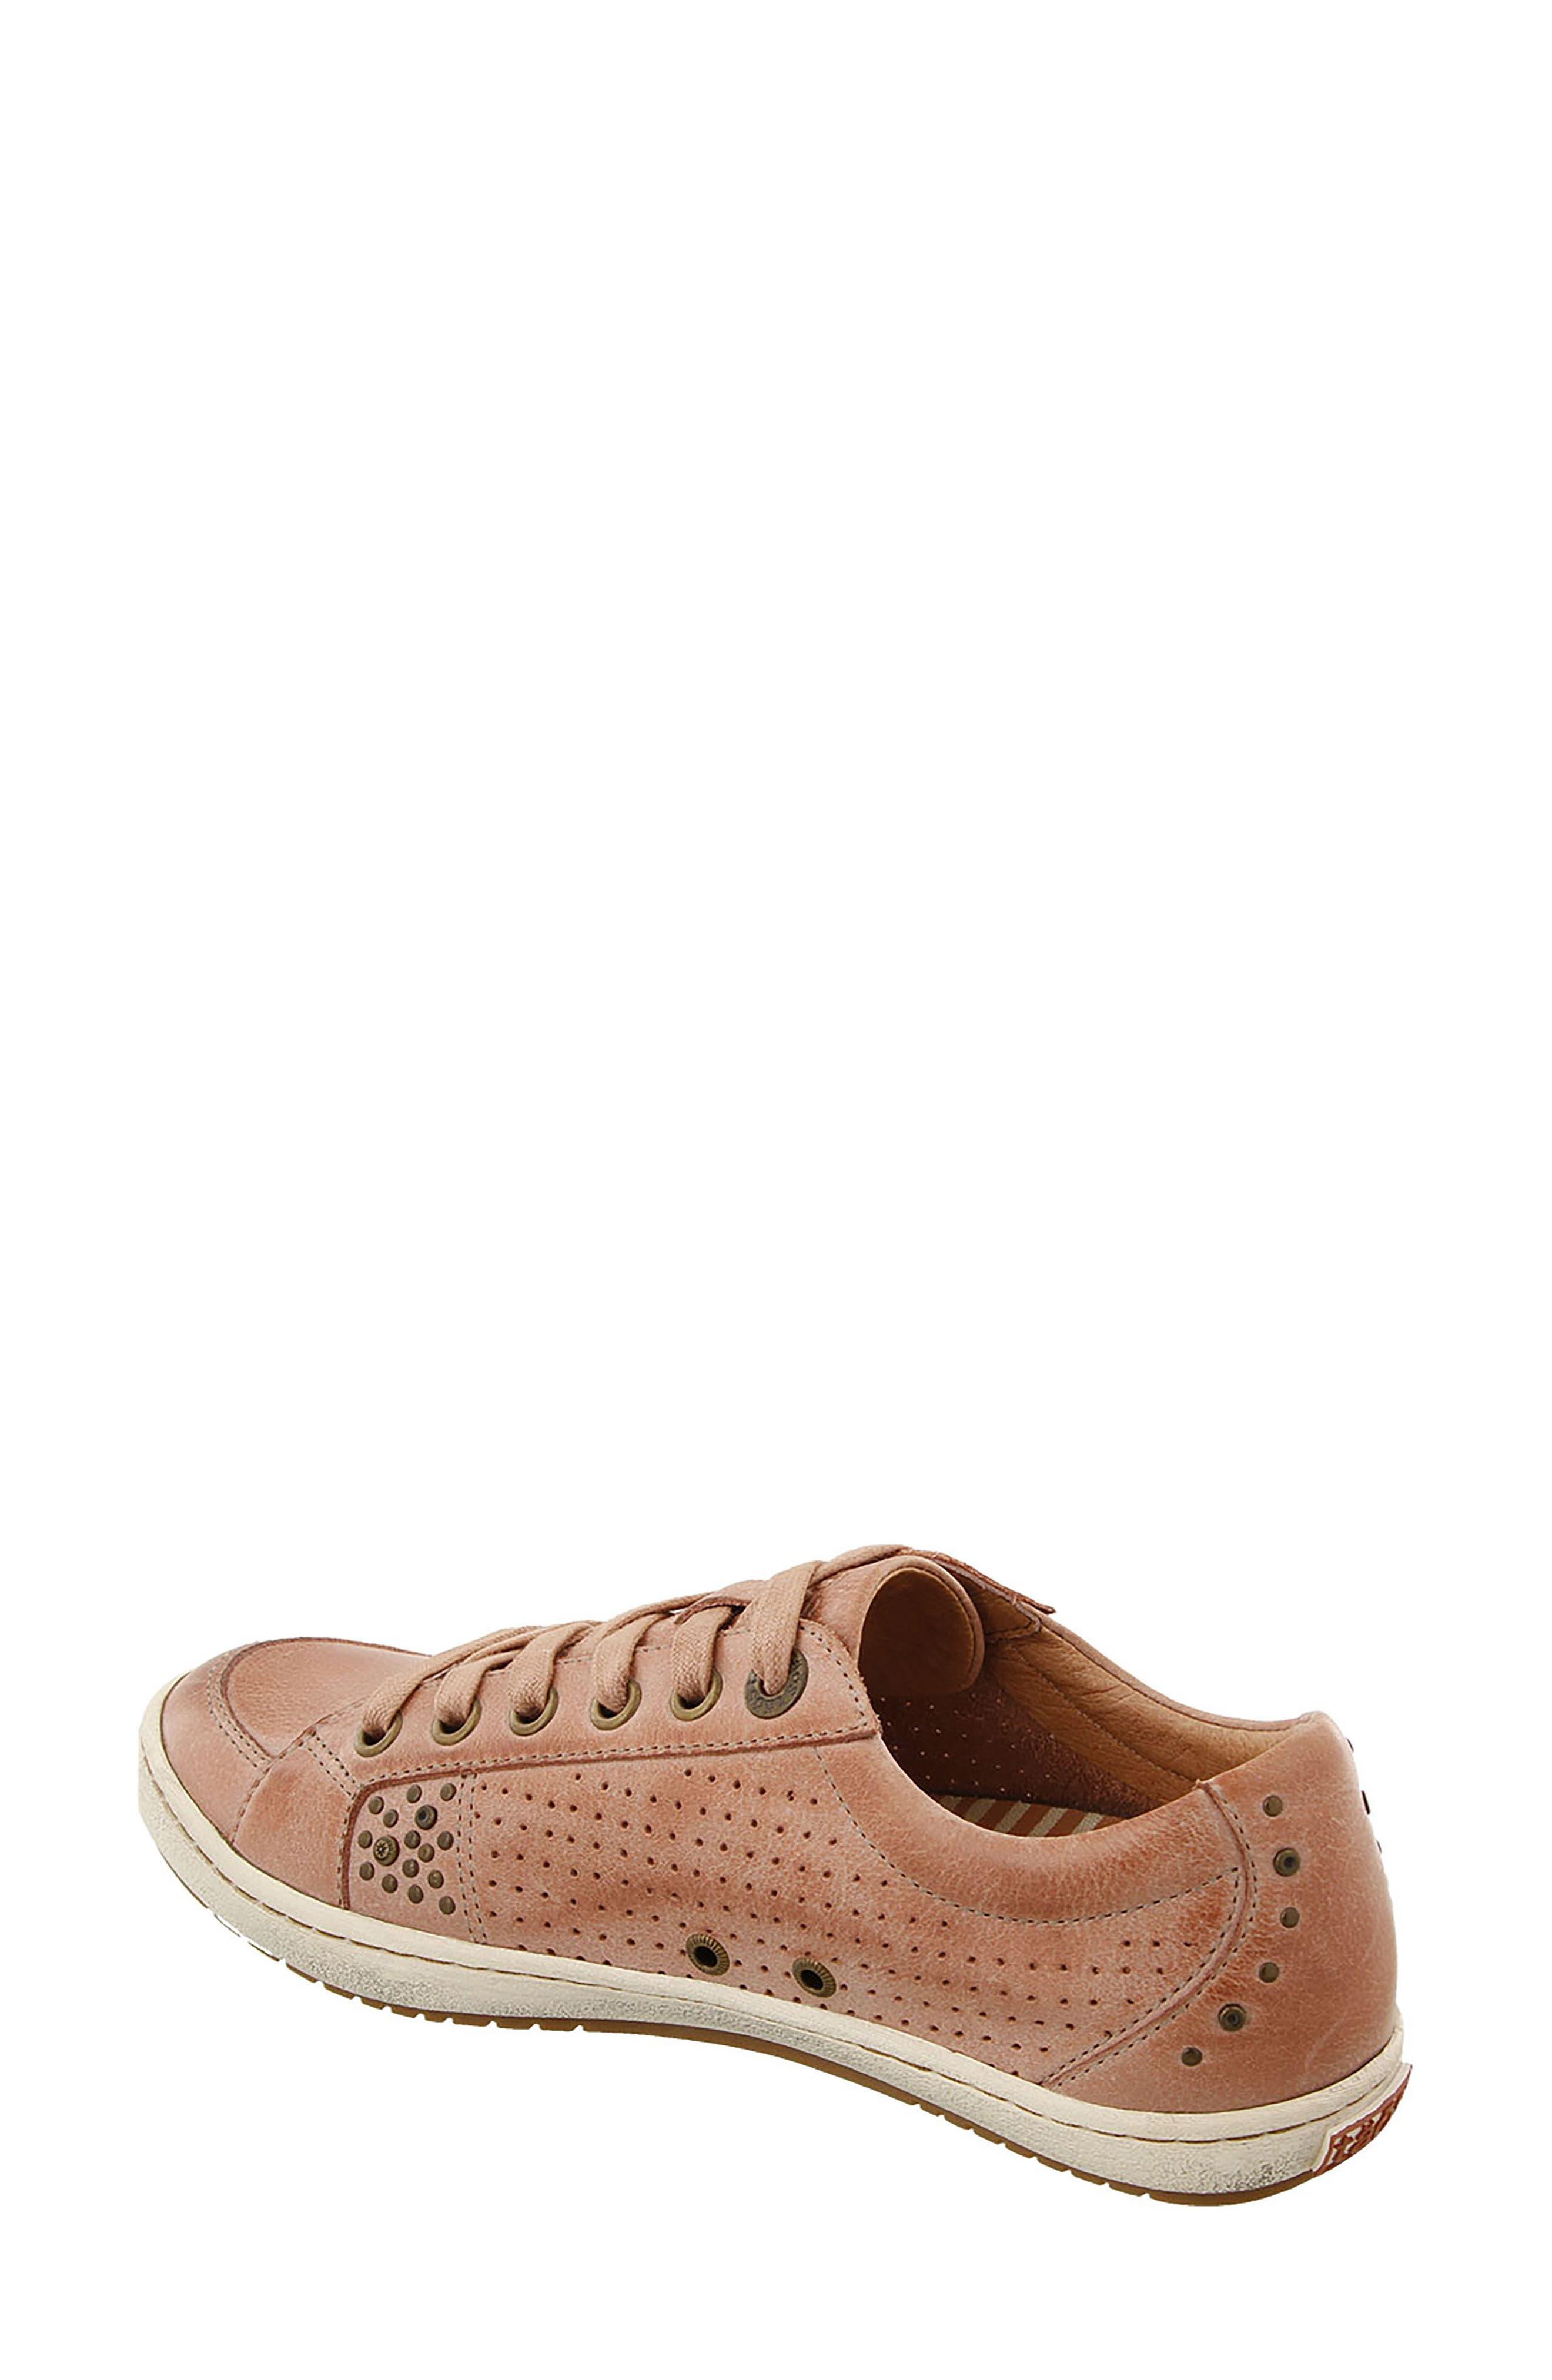 Alternate Image 2  - Taos 'Freedom' Sneaker (Women)